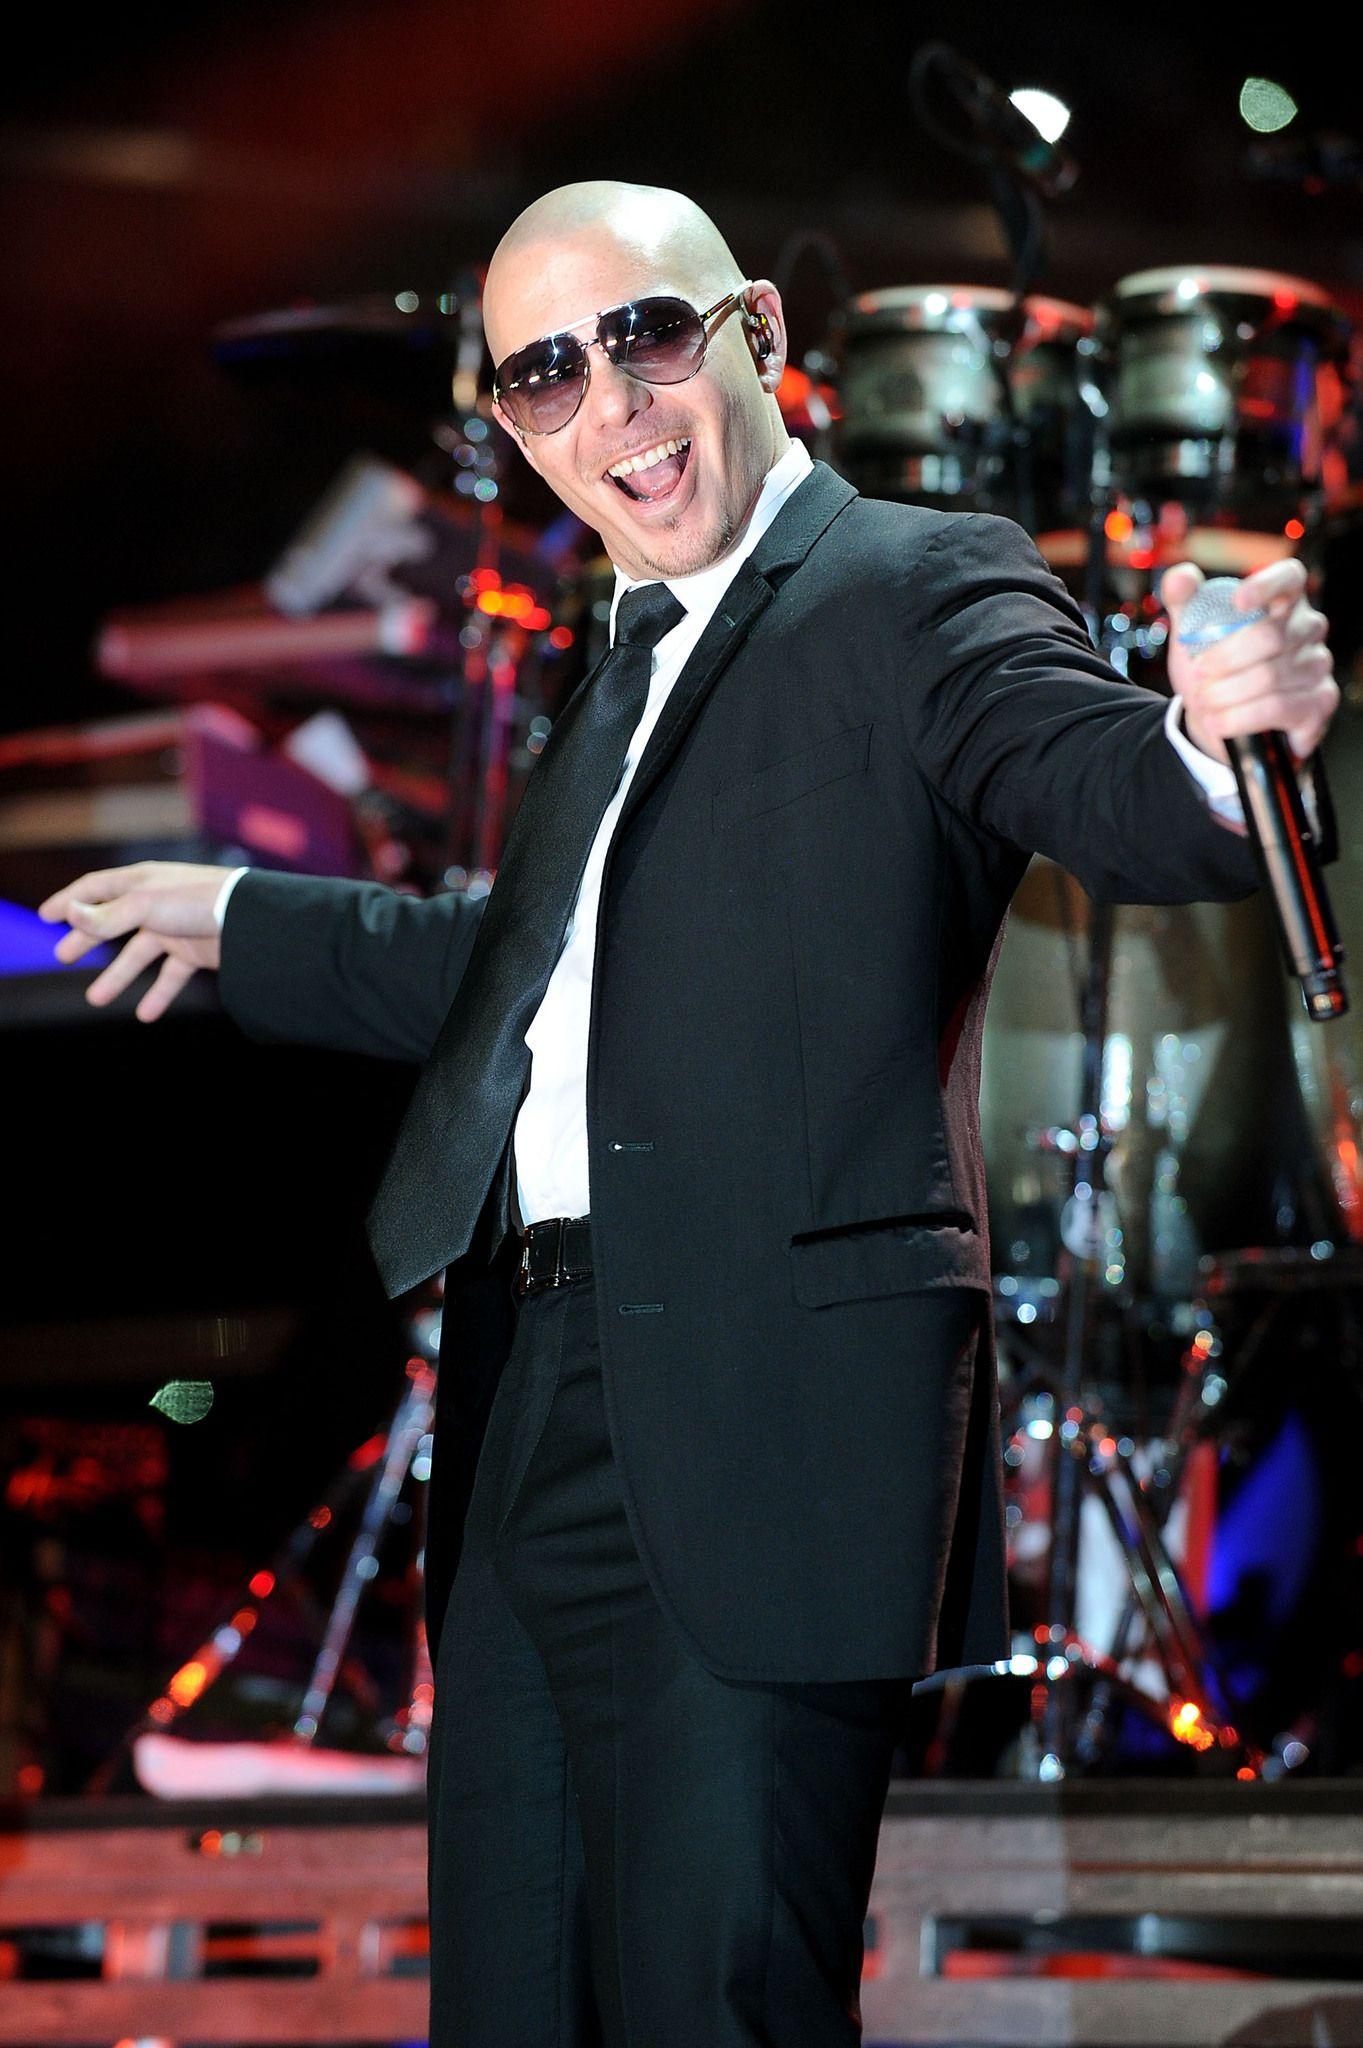 Pictures & Photos of Pitbull IMDb Pitbull music